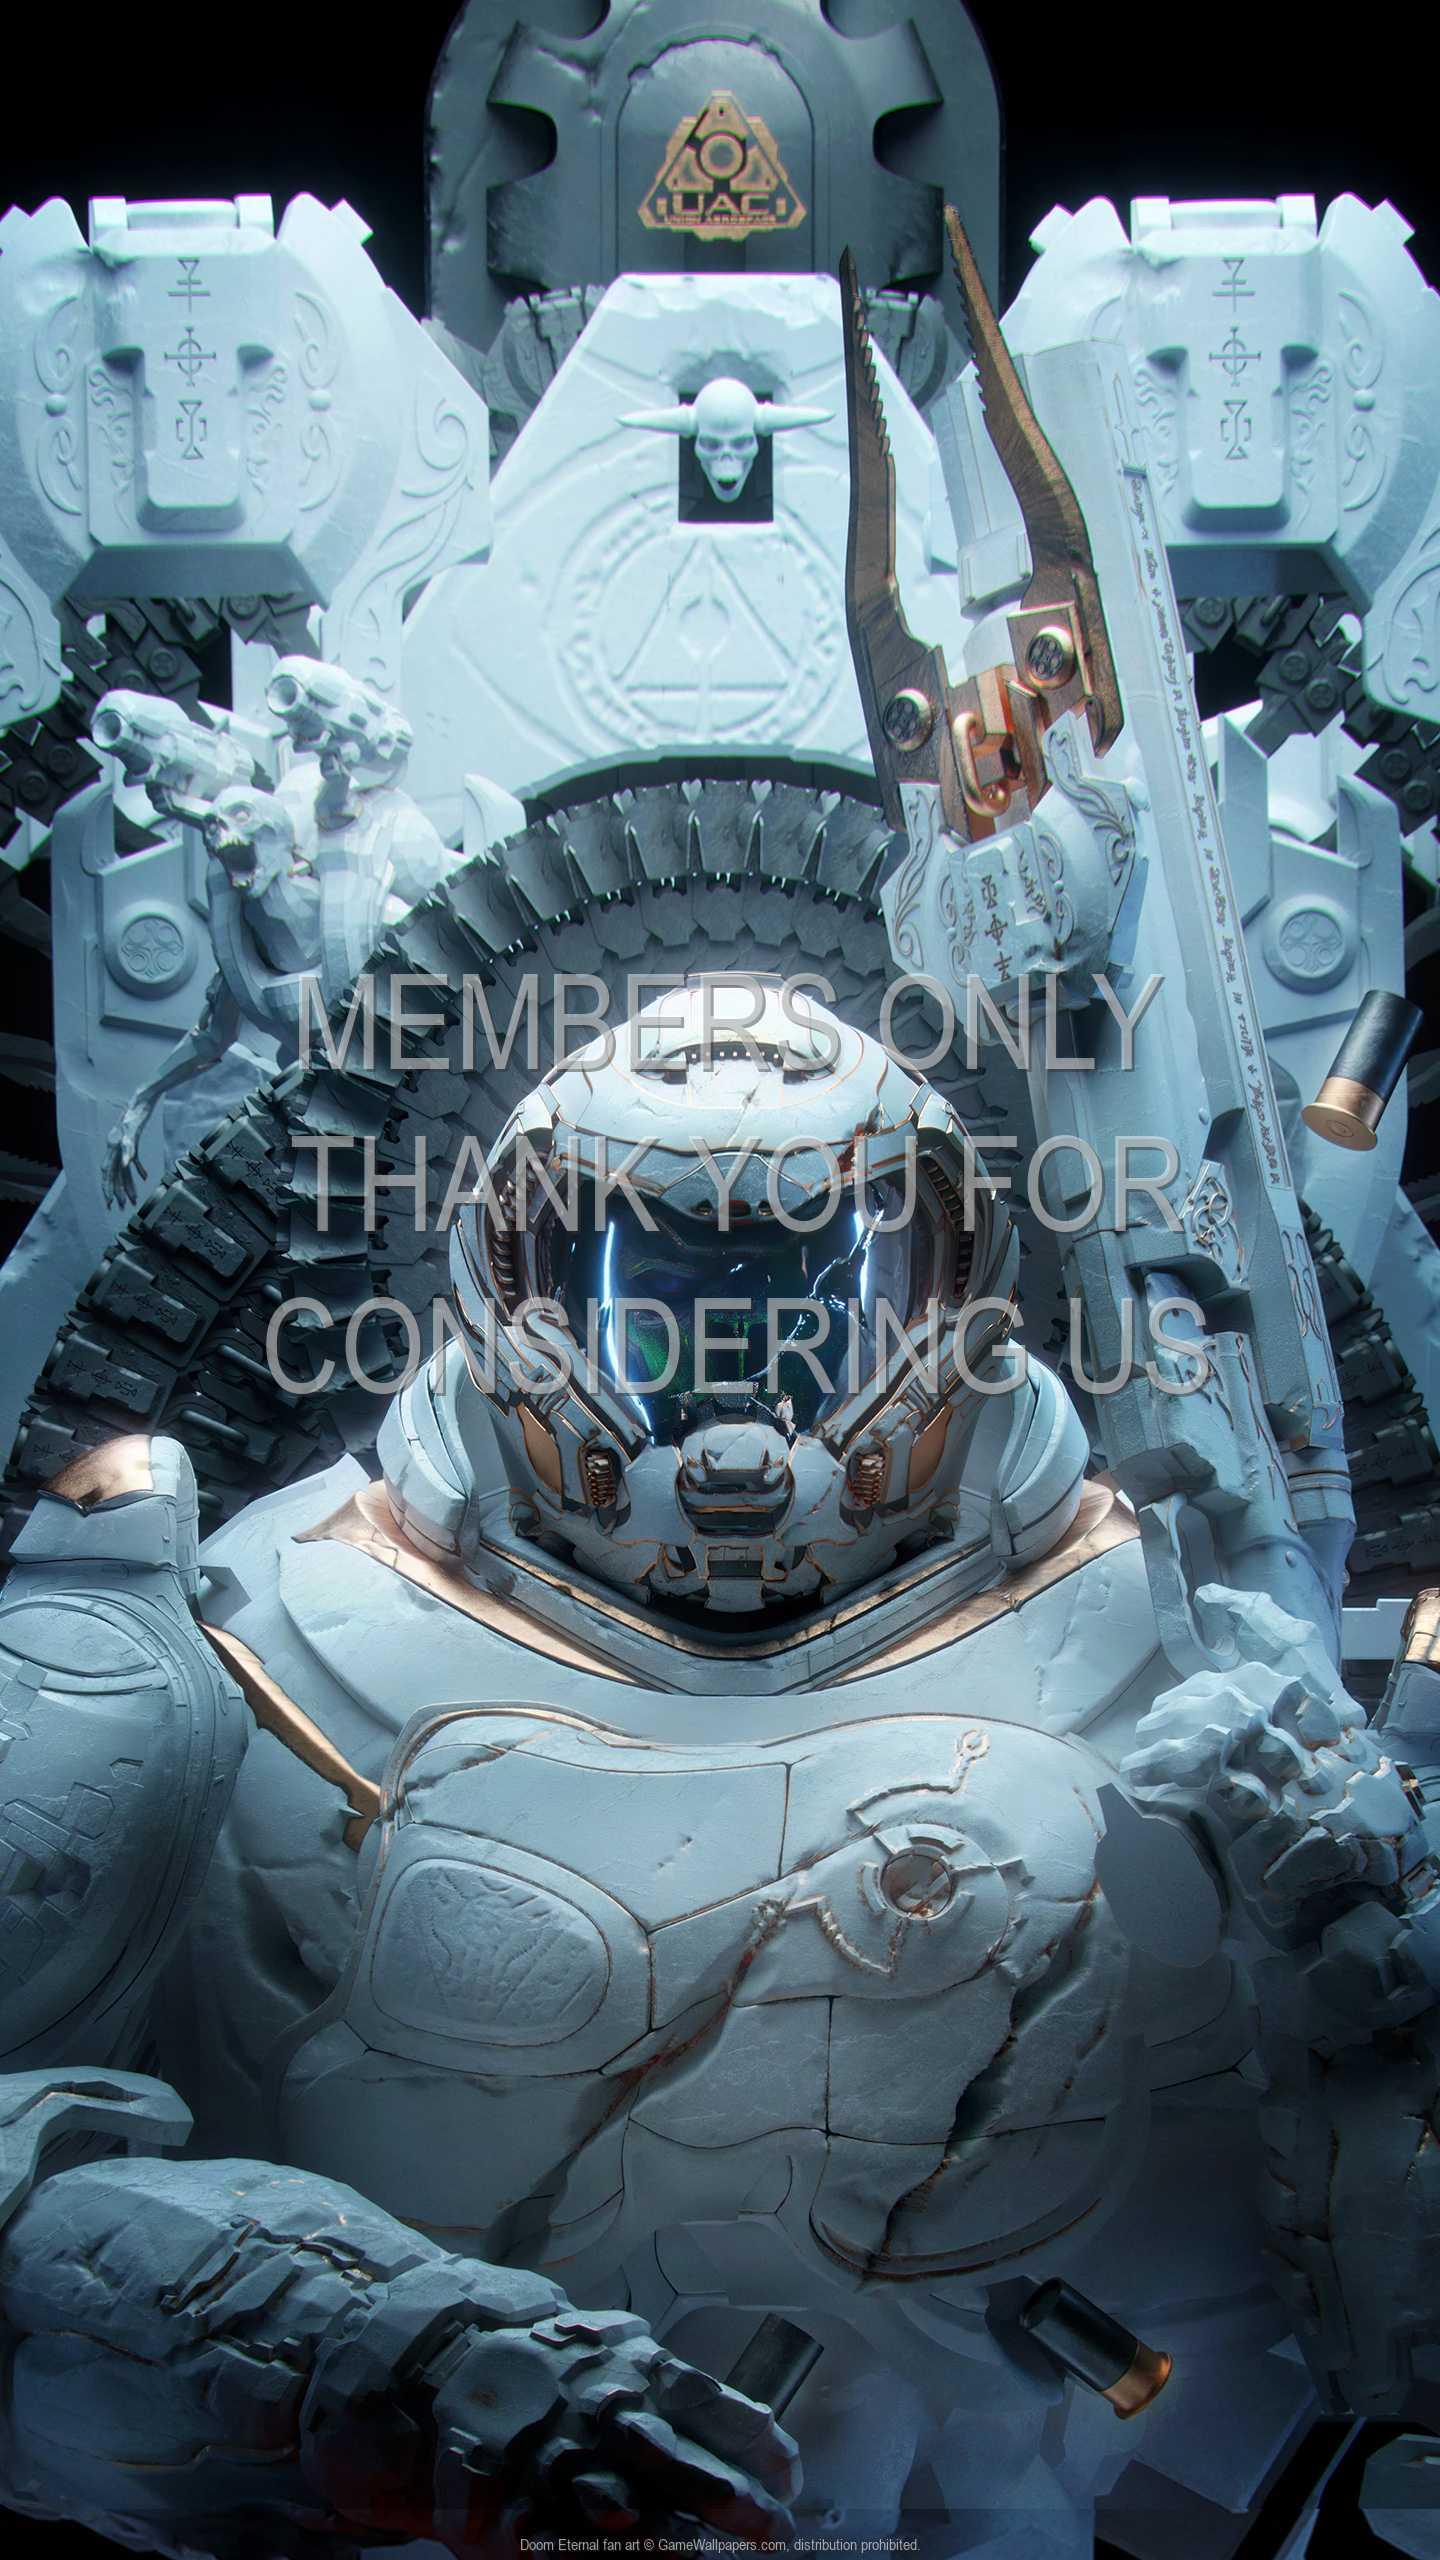 Doom Eternal fan art 1440p Vertical Mobile wallpaper or background 02